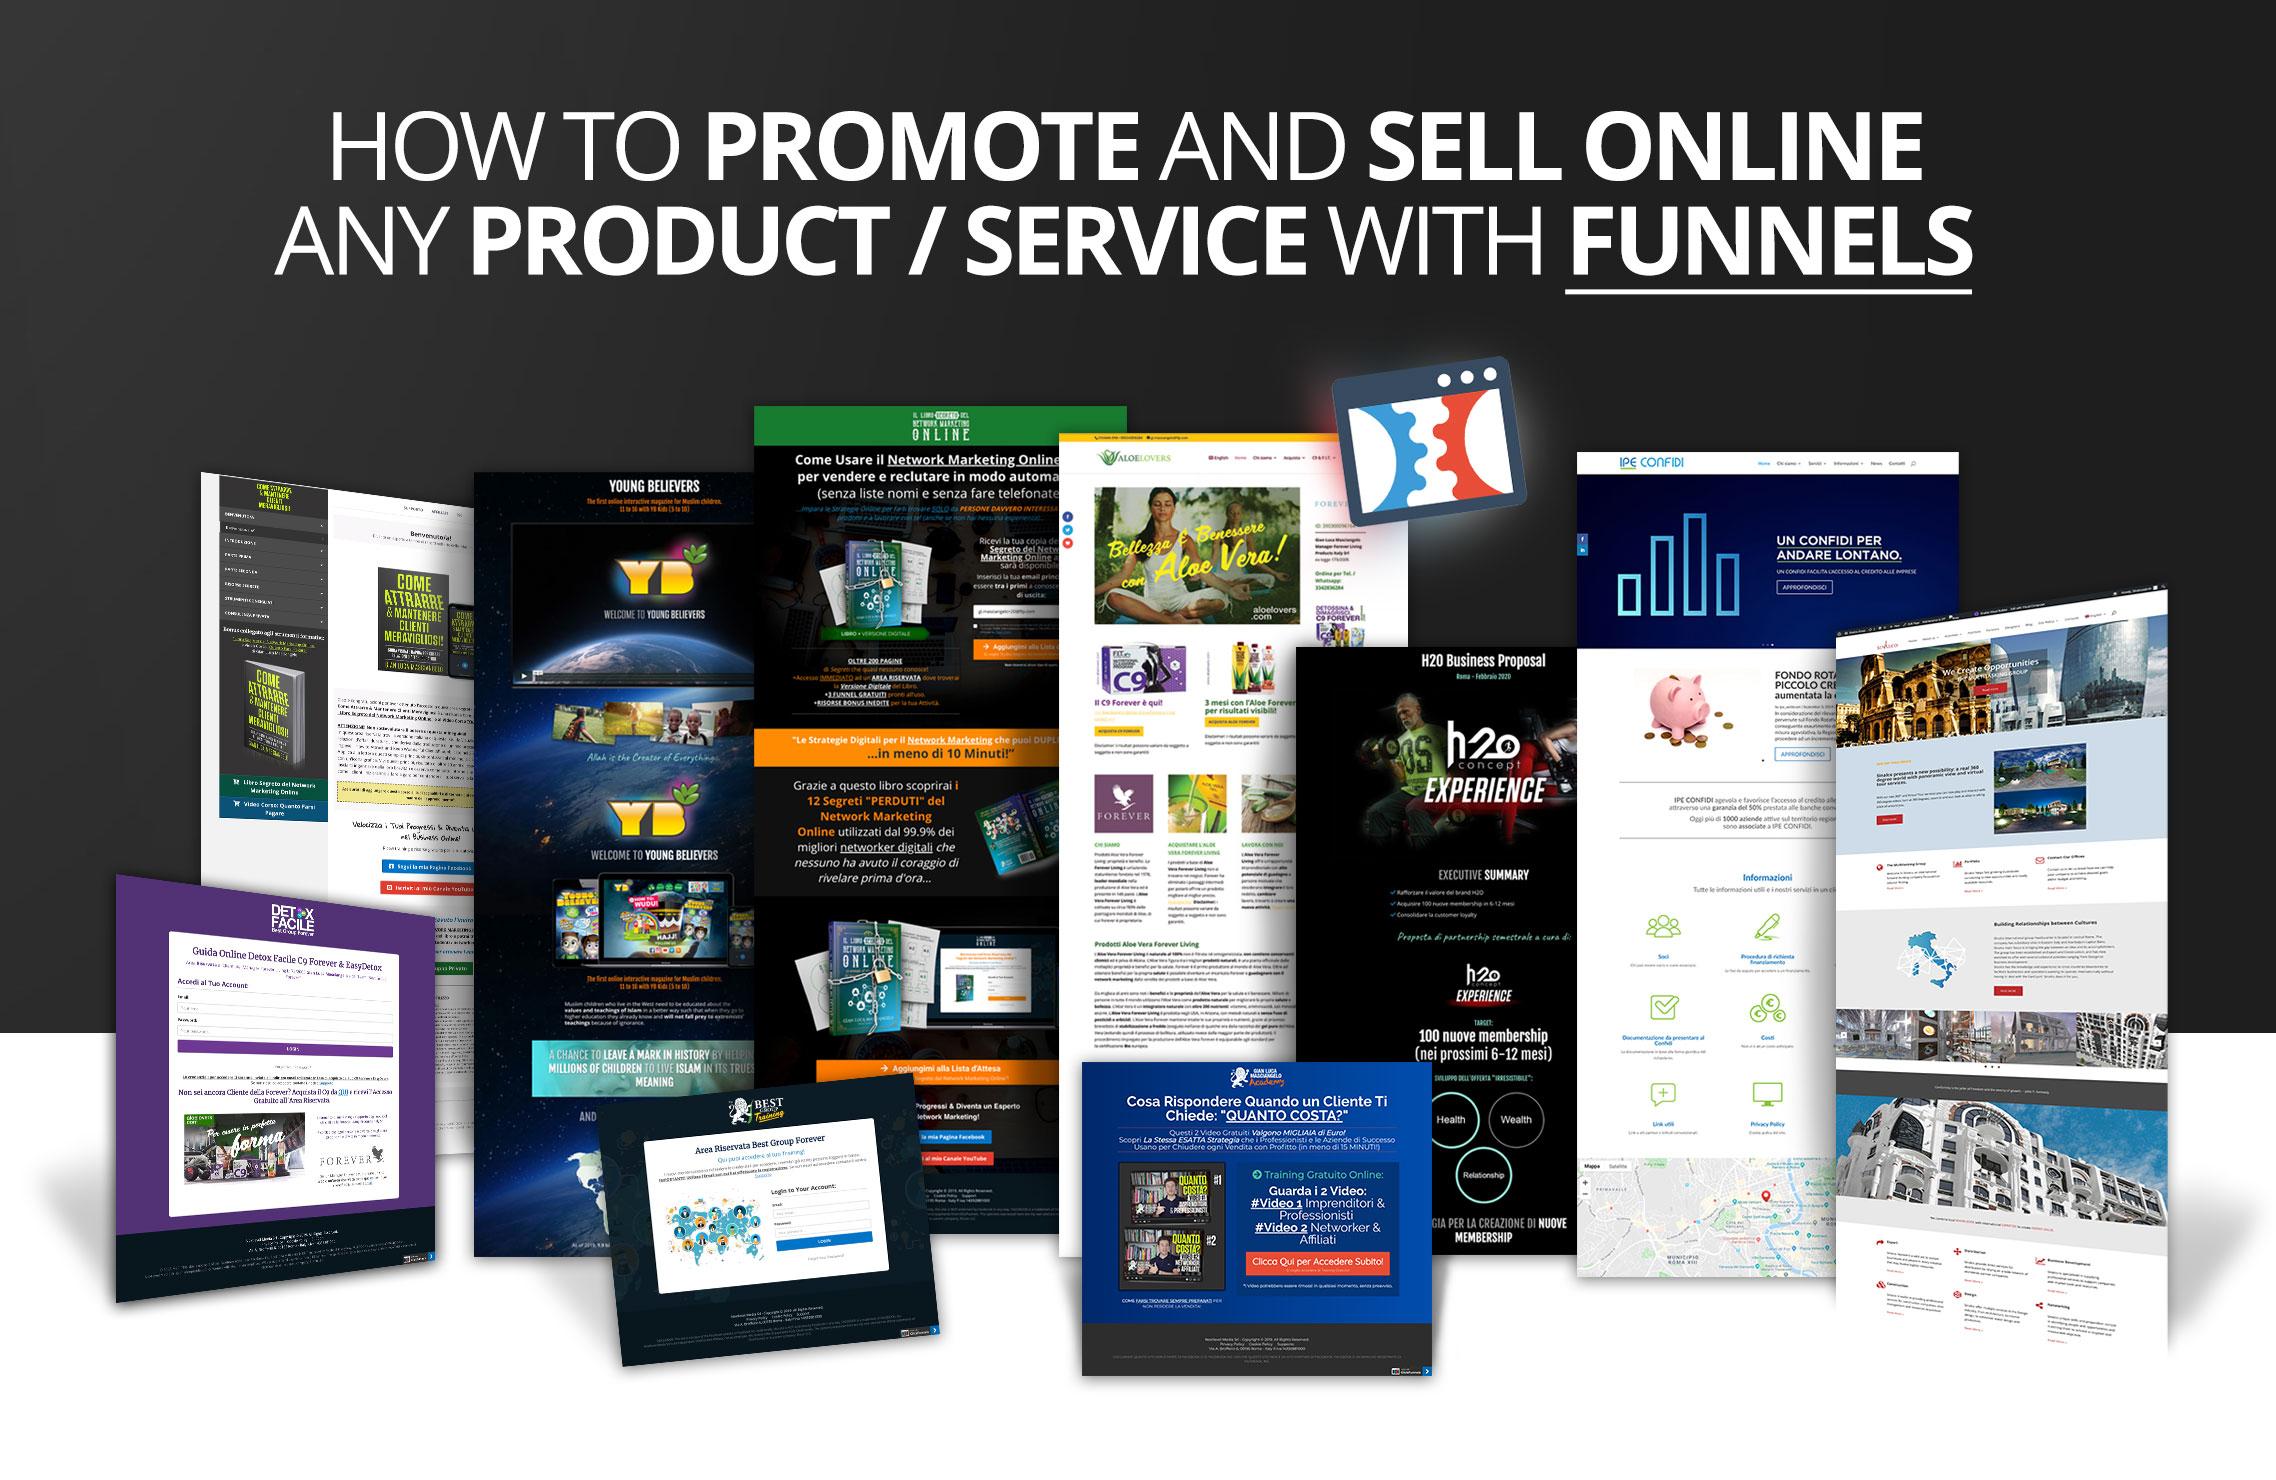 Funnel-marketing-nextlevel-media-rome